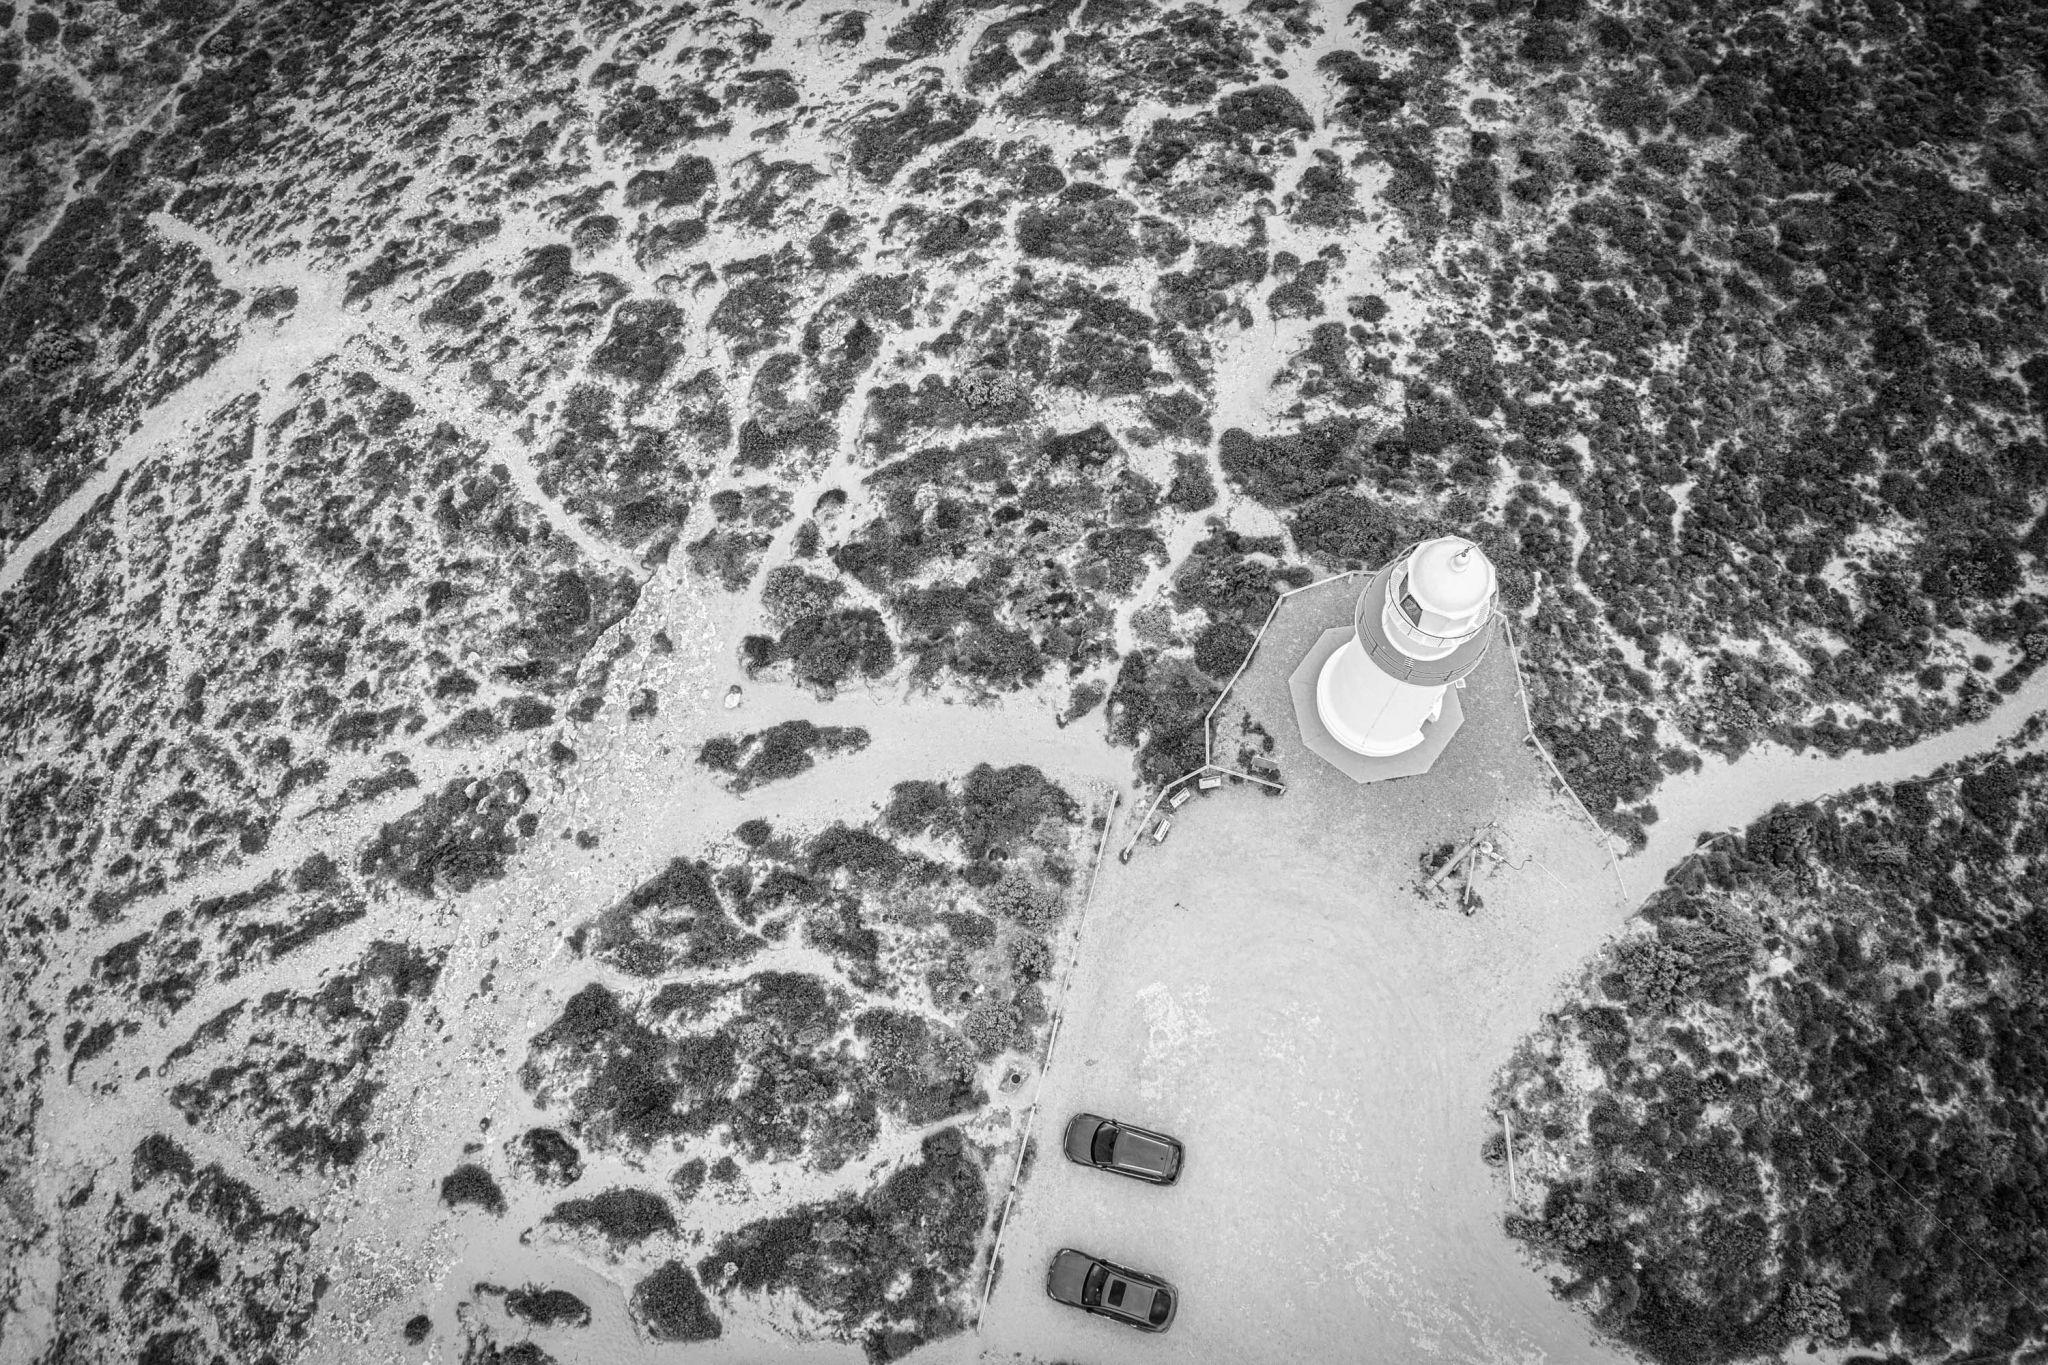 Corny Point lighthouse Yorke Peninsula South Australia, Australia